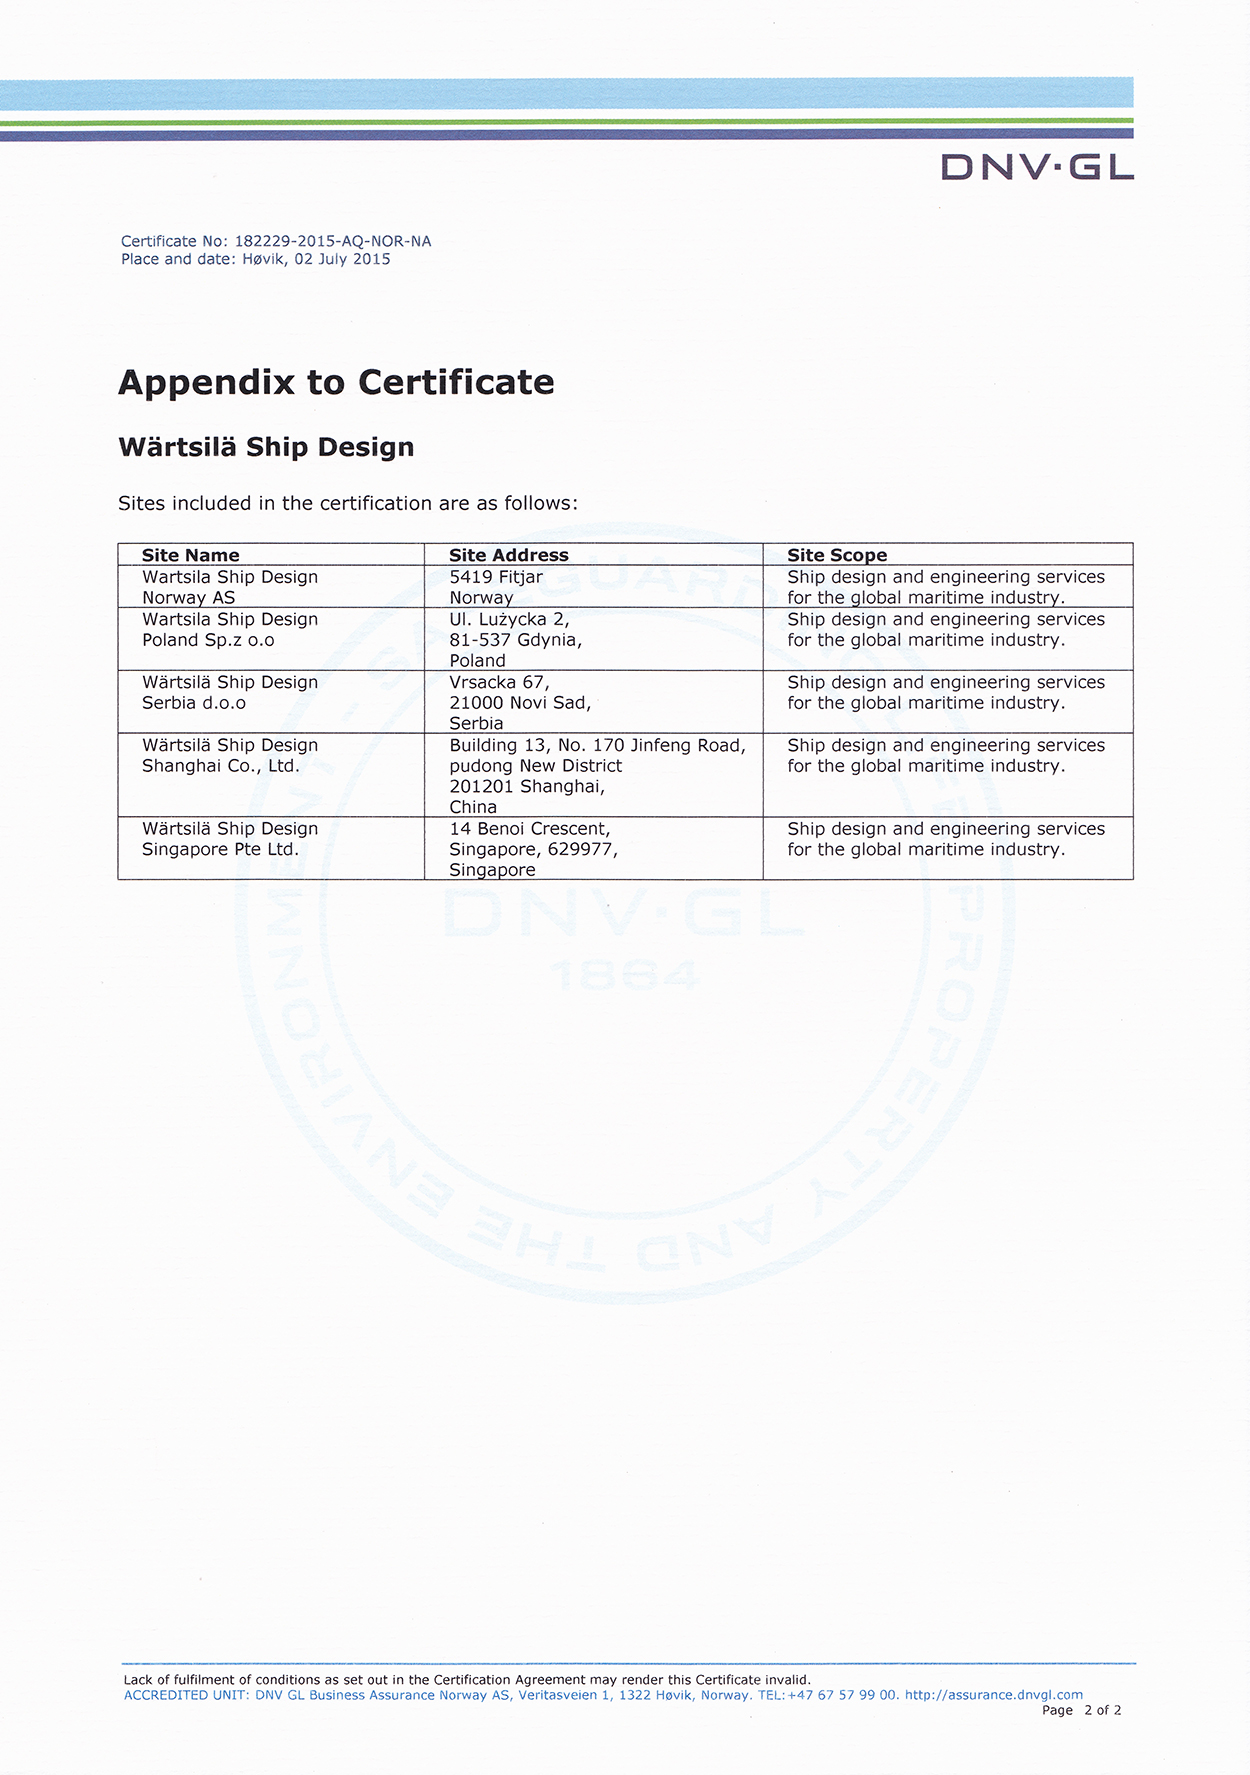 WSD ISO 9001 Certificate - Appendix